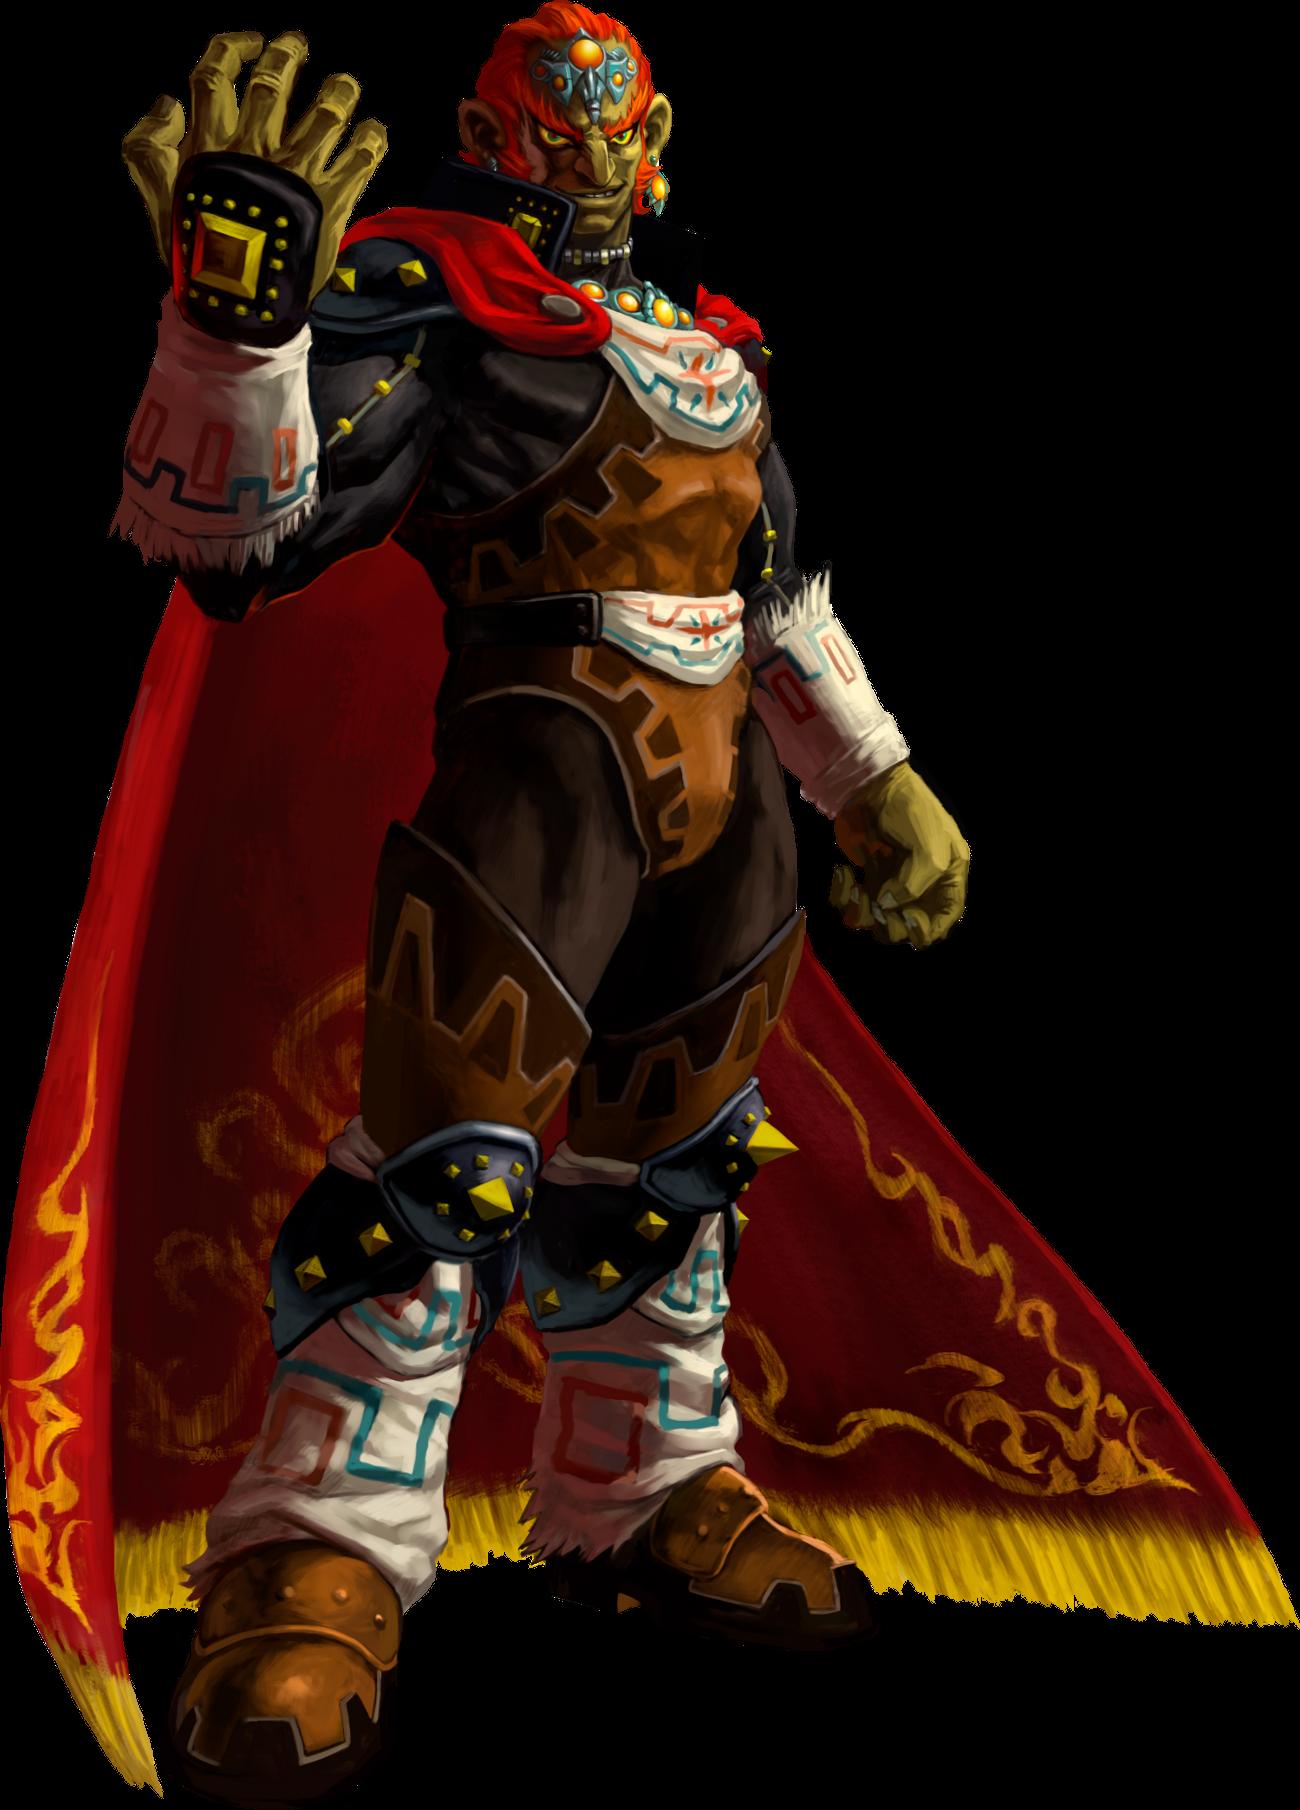 Ganondorf (Ocarina of Time) | Zeldapedia | Fandom